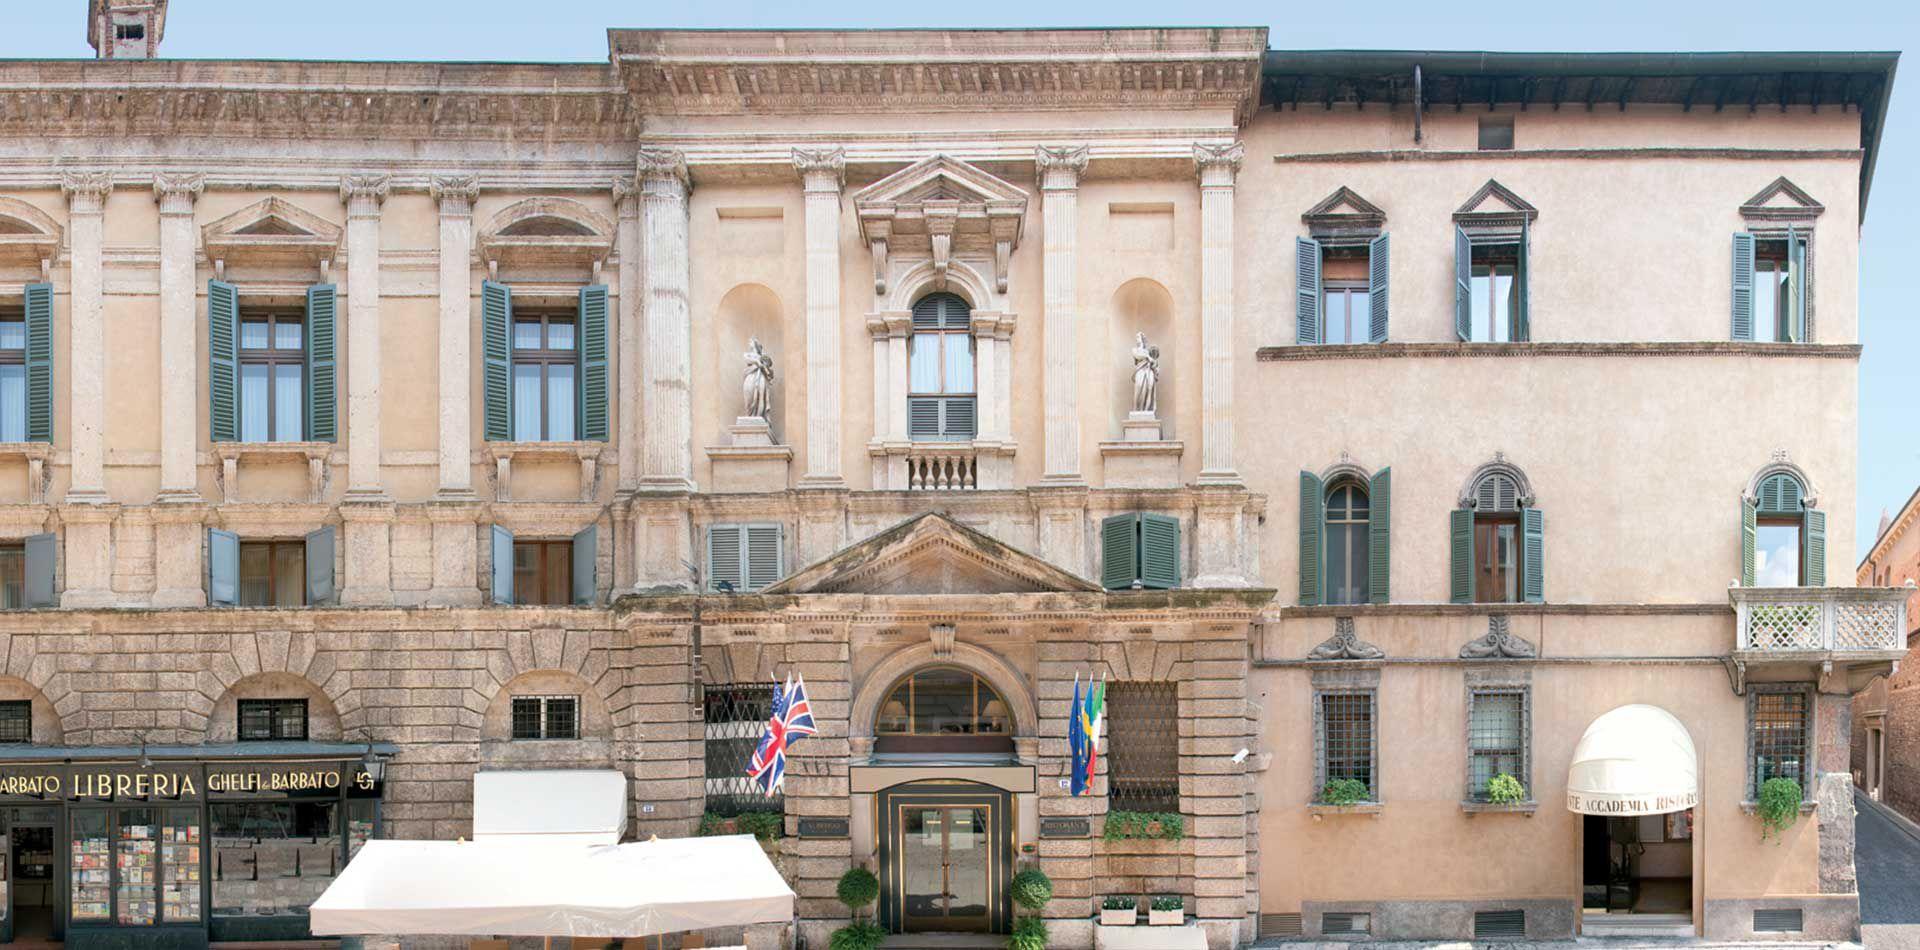 Hotel Accademia - Festival de Verona 2018